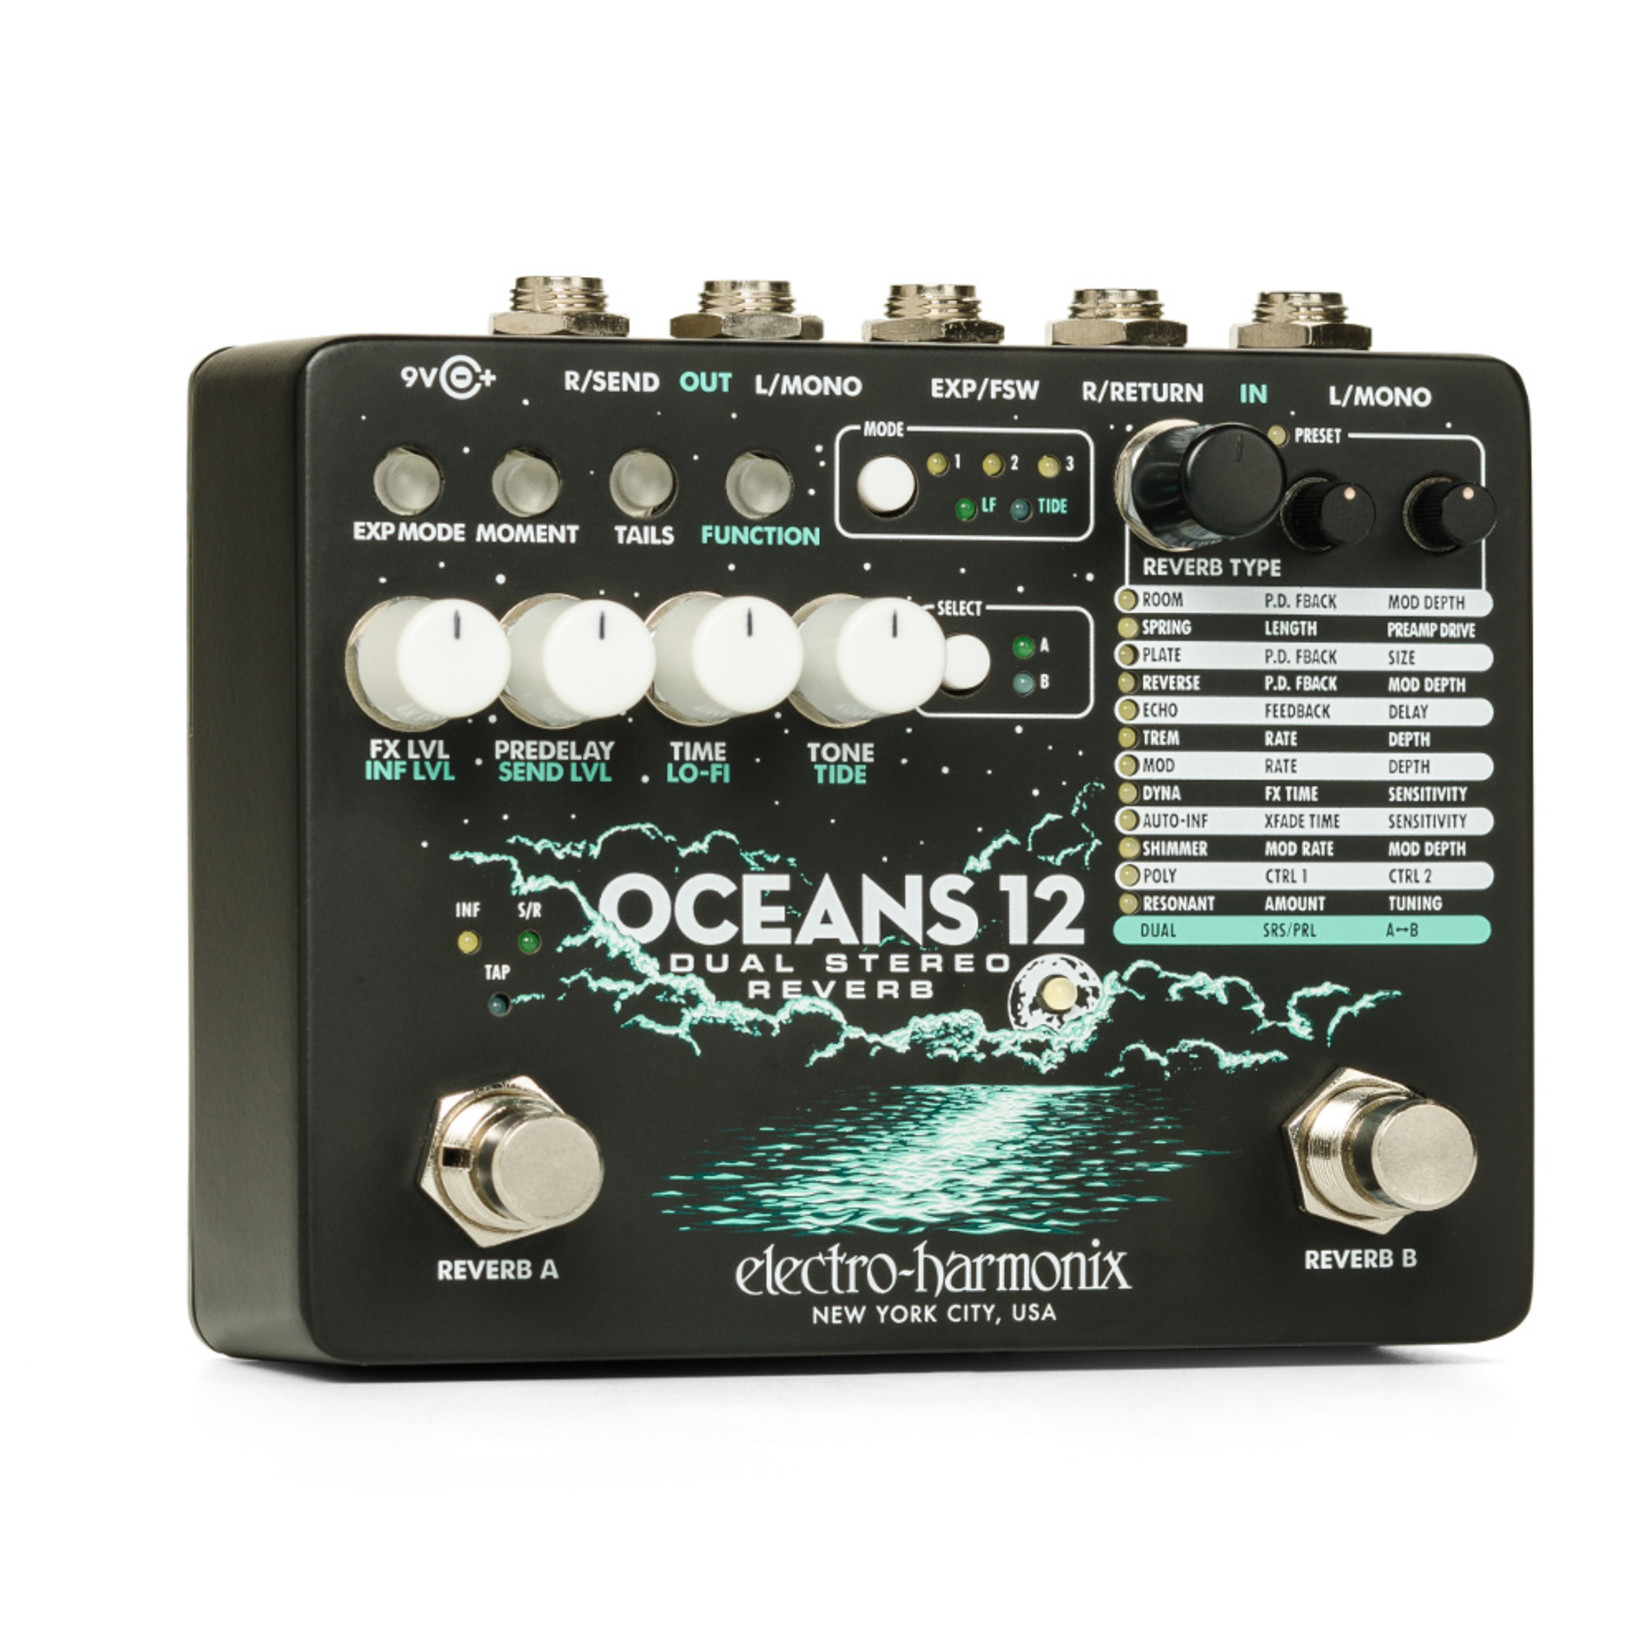 Electro-Harmonix Electro-Harmonix Oceans 12 Dual Stereo Reverb